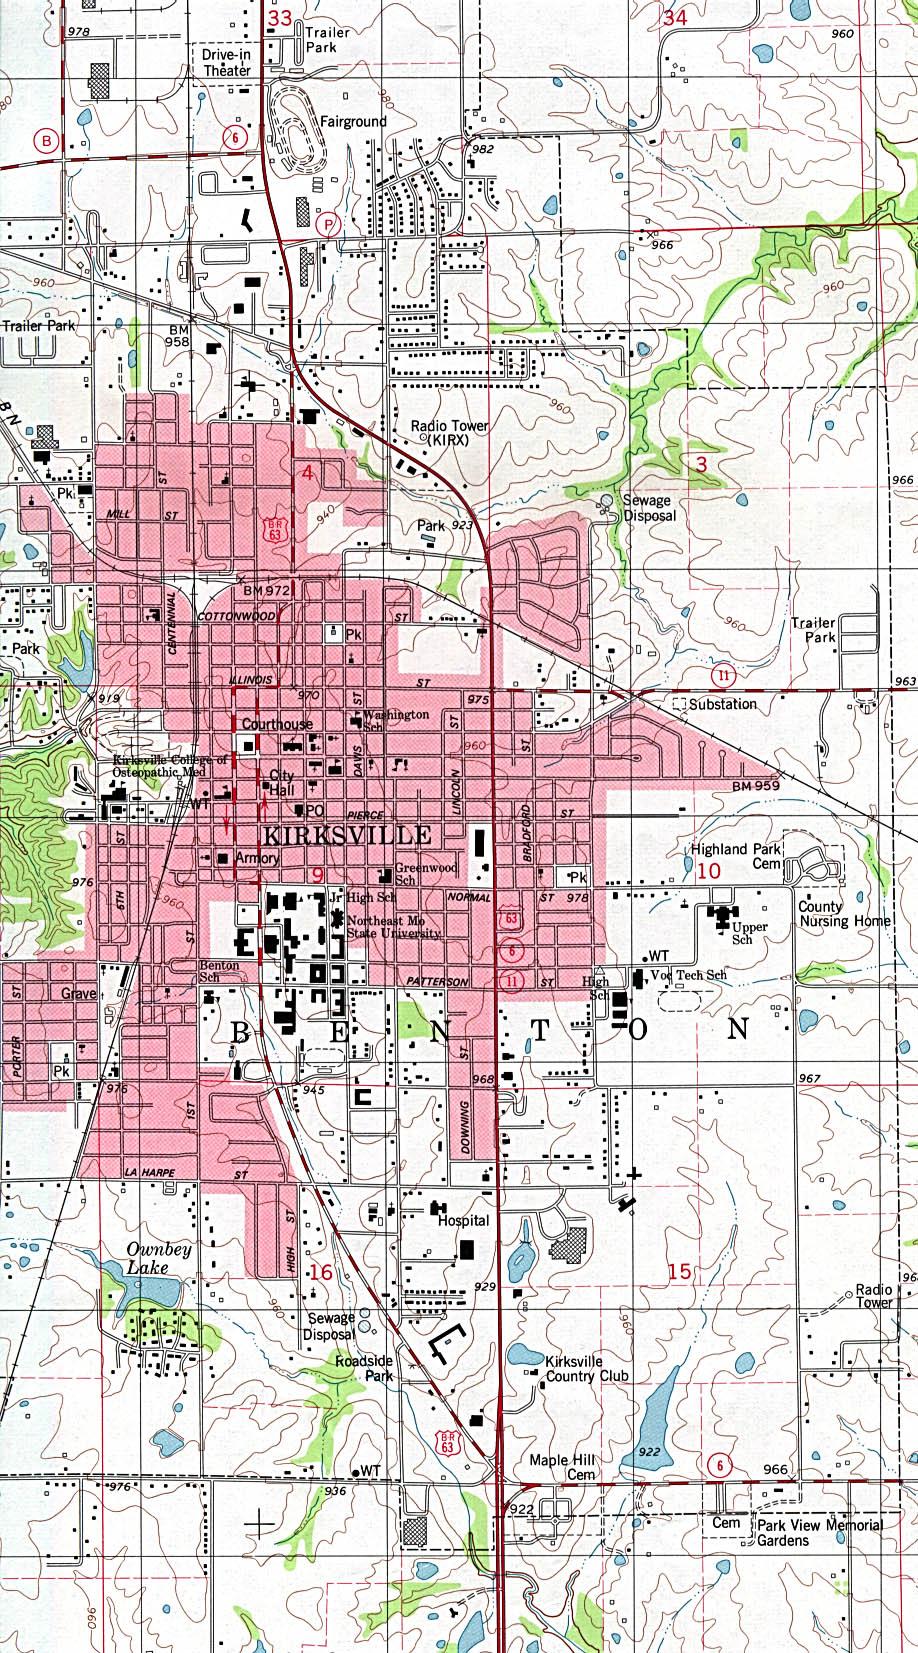 Kirksville Mapa Topográfico de la Ciudad de Kirksville, Missouri, Estados Unidos